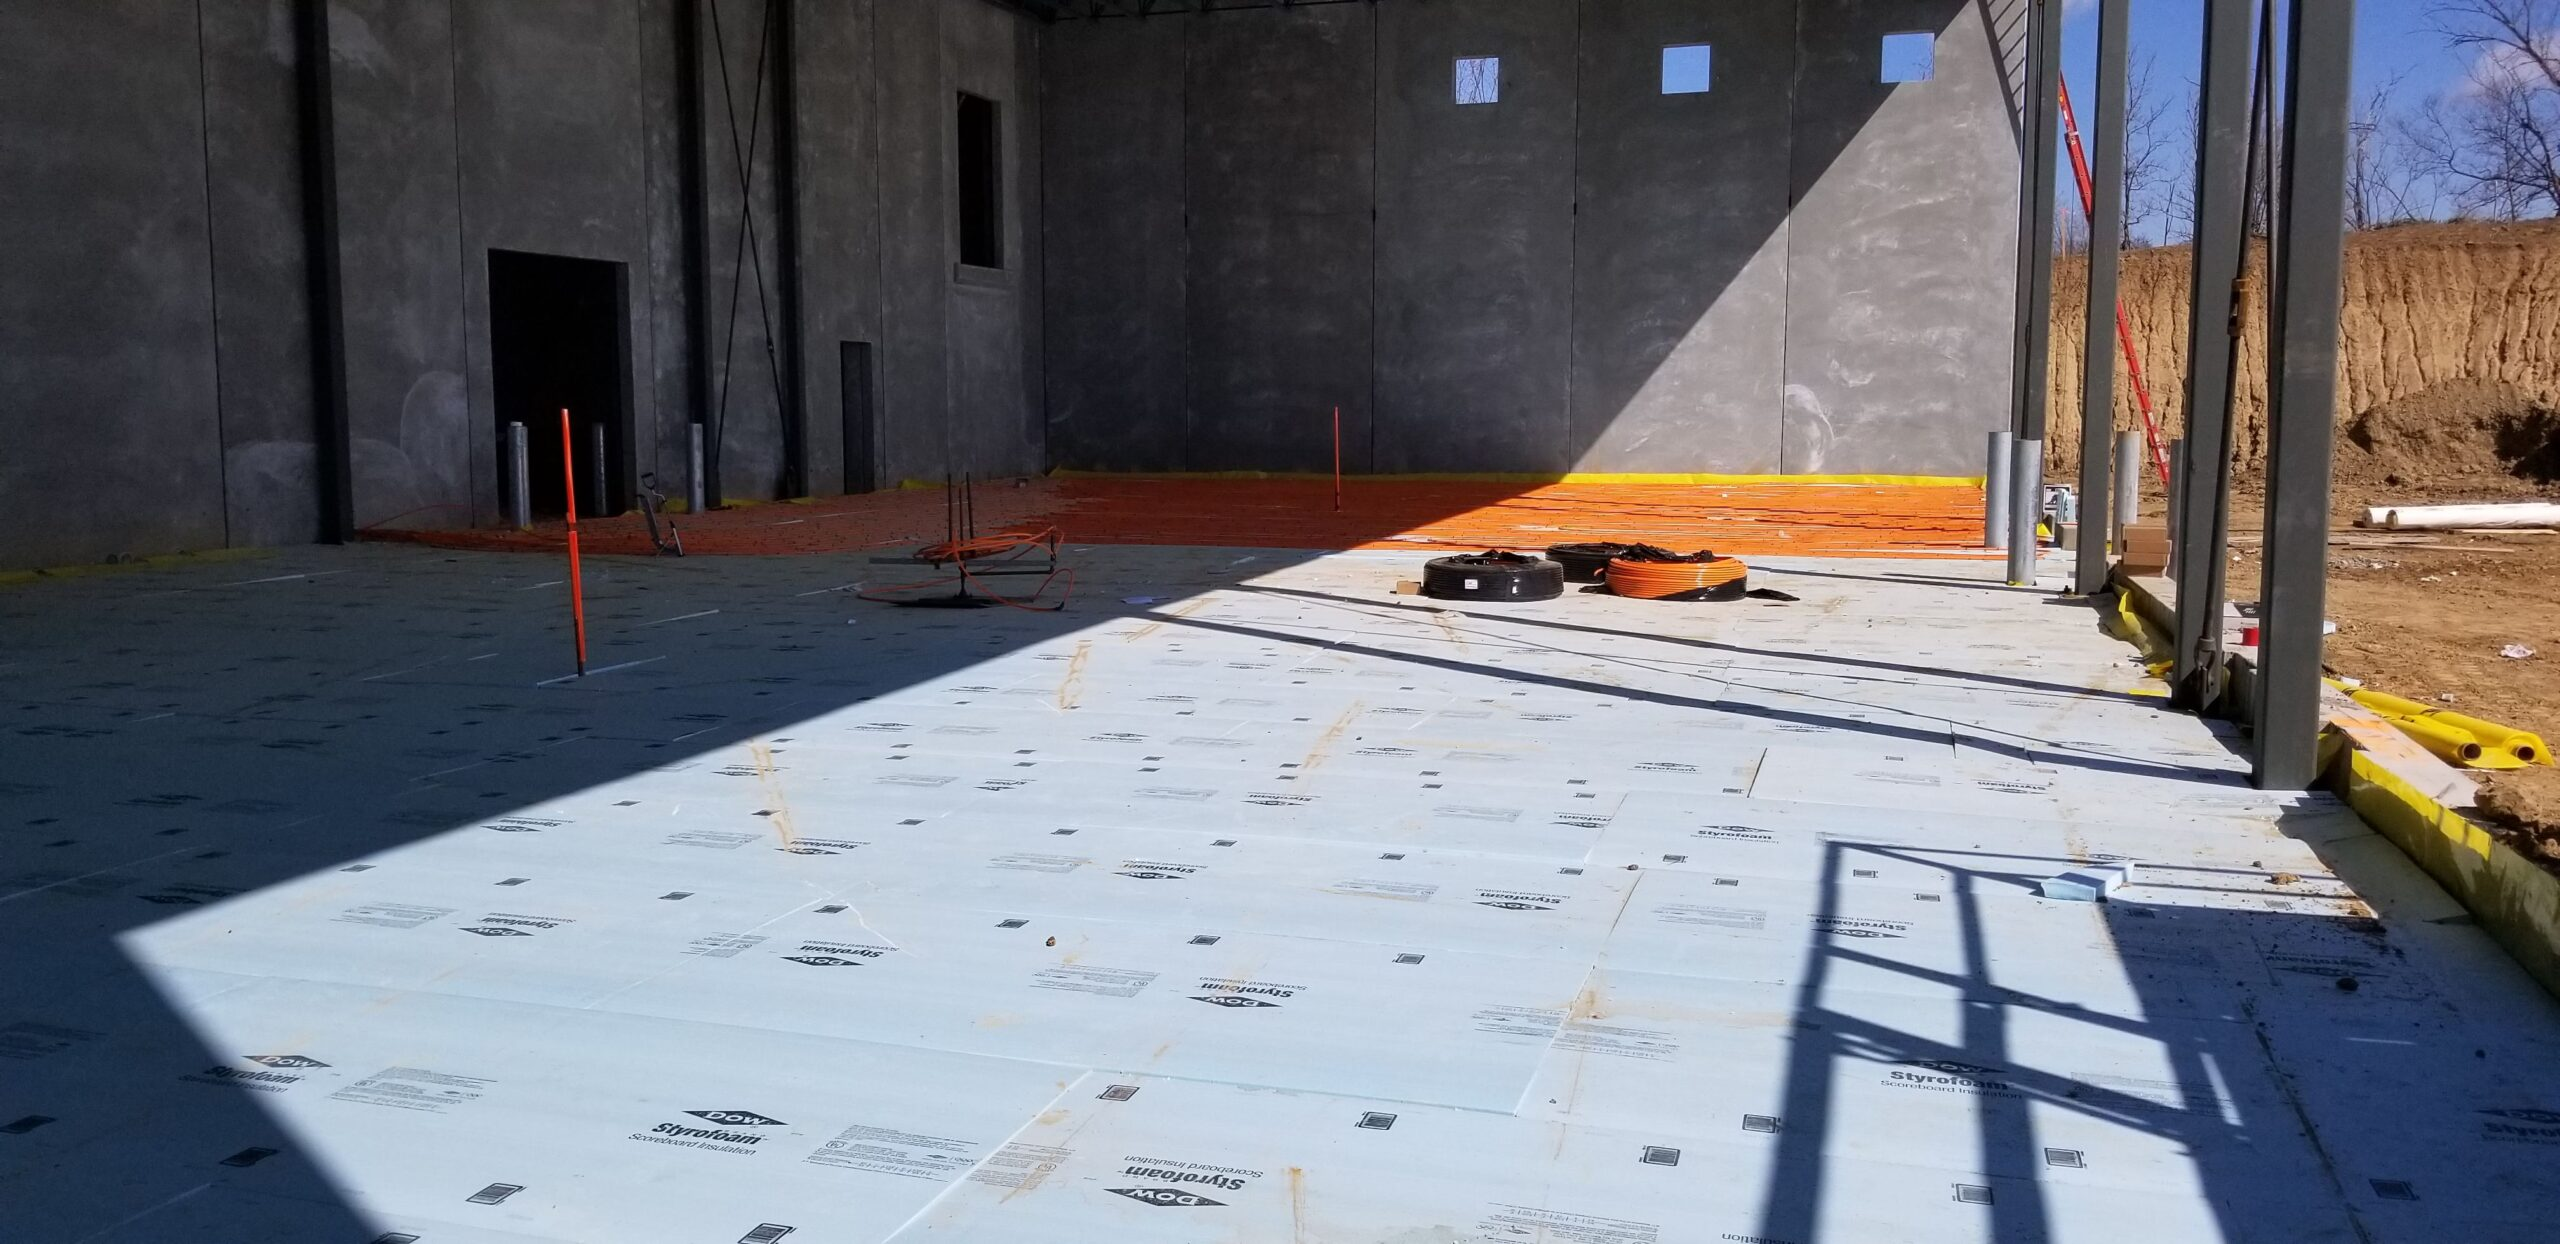 Quin Global New Construction warehouse in floor heating